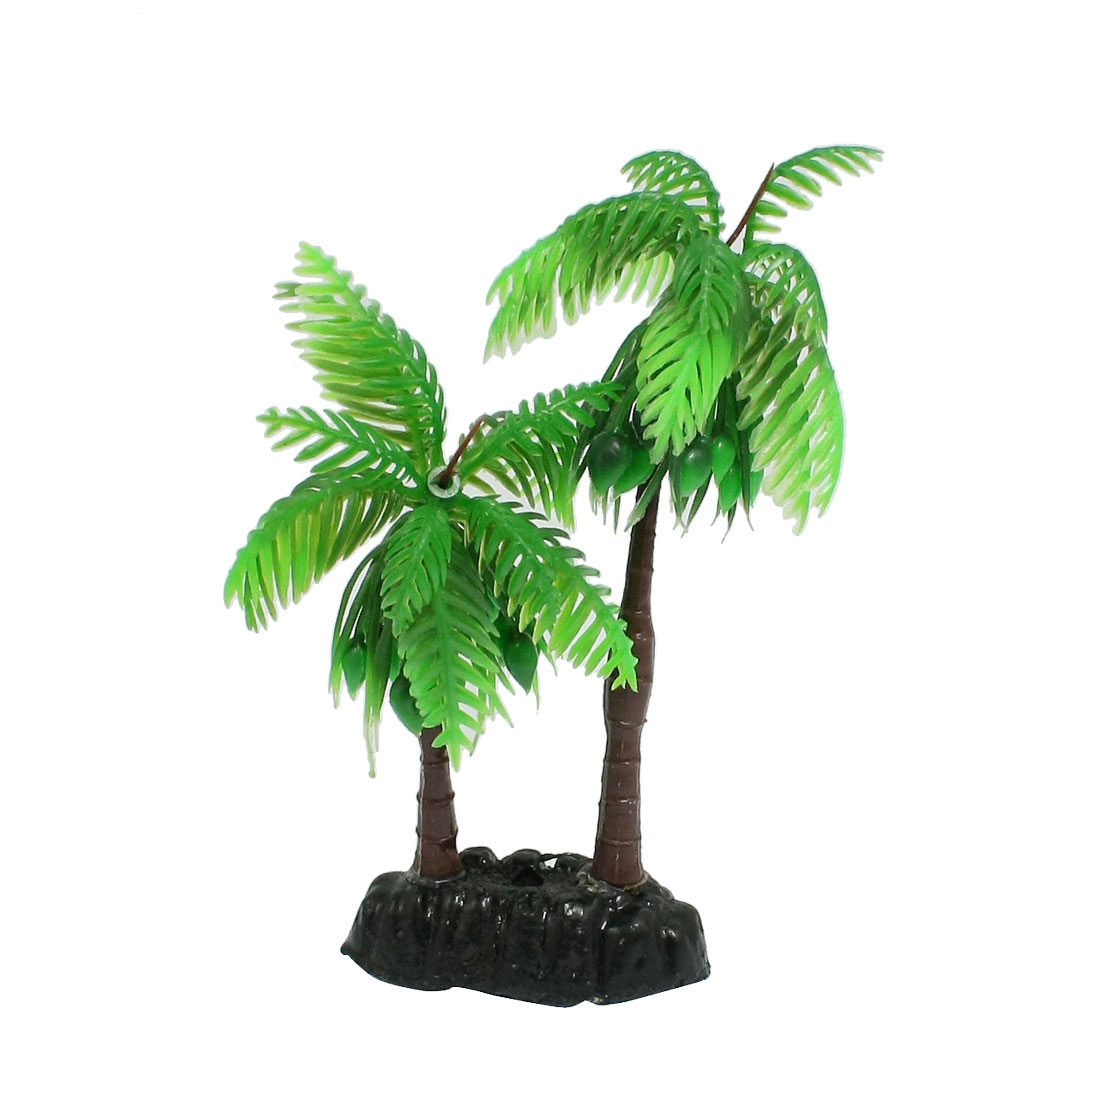 "4.9"" Height Green Artificial Aquarium Decor Coconut Palm Plant"